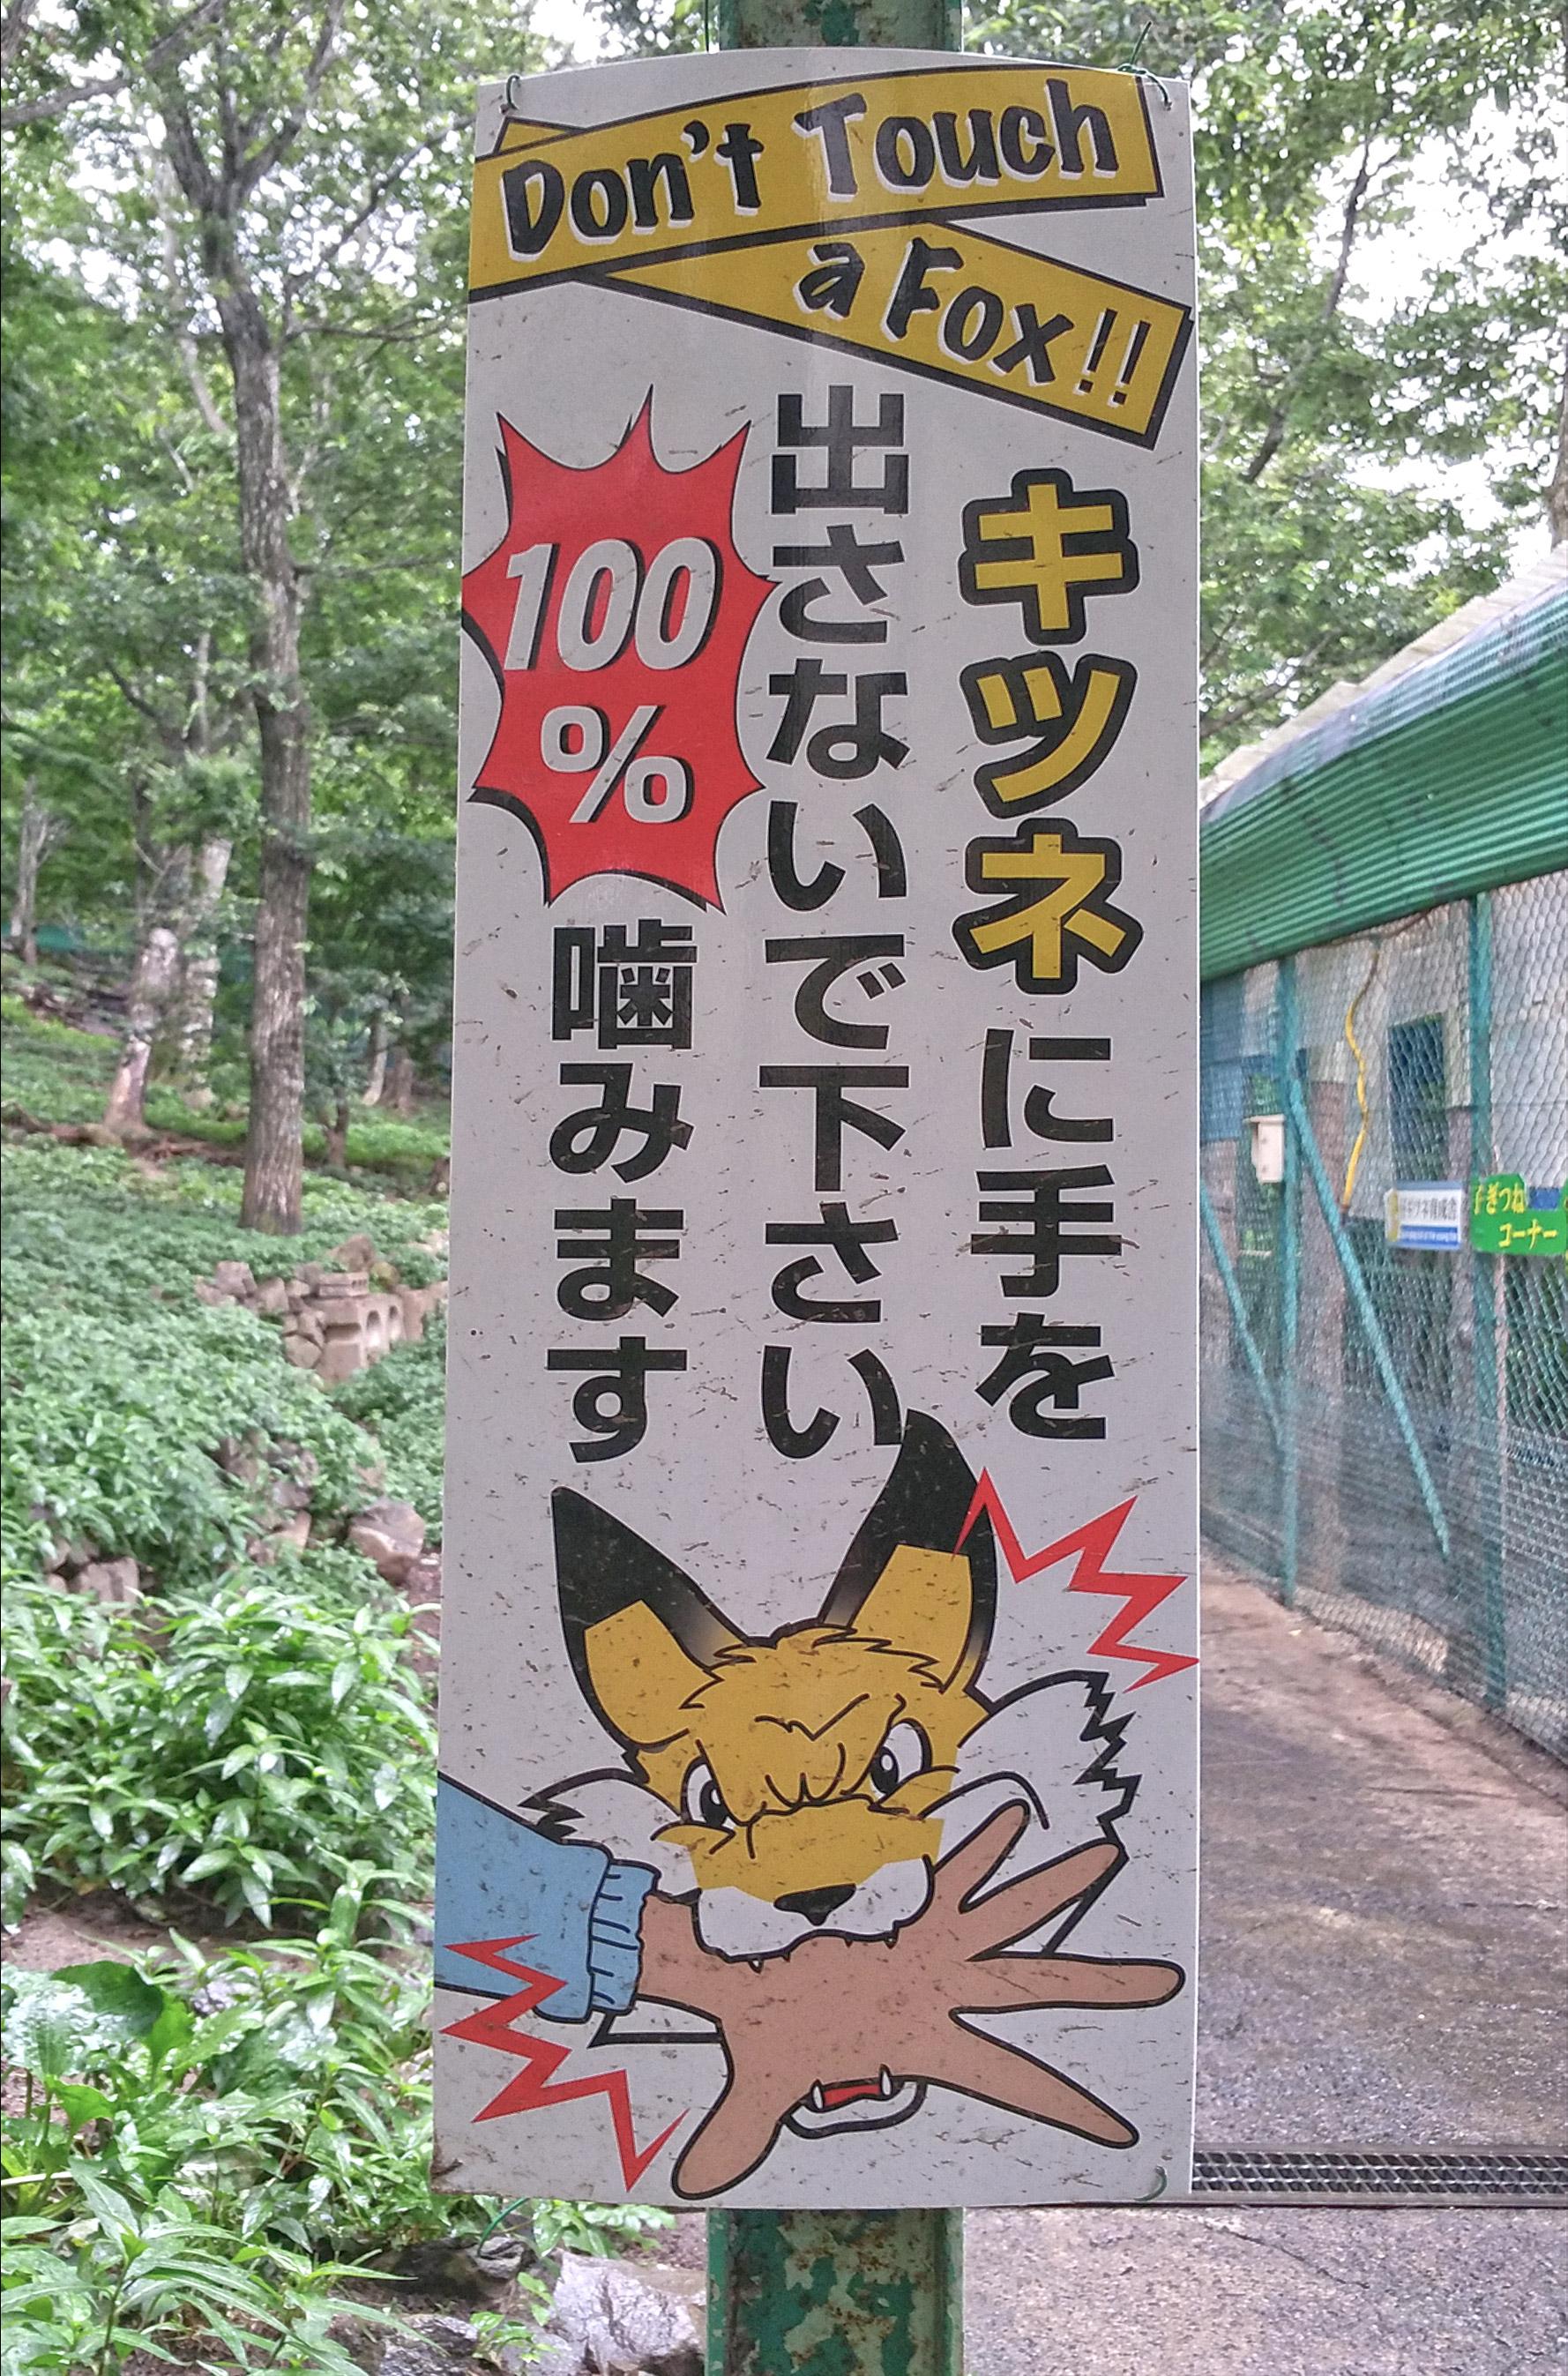 Zao-Fox-Village-Bite-Sign.jpg